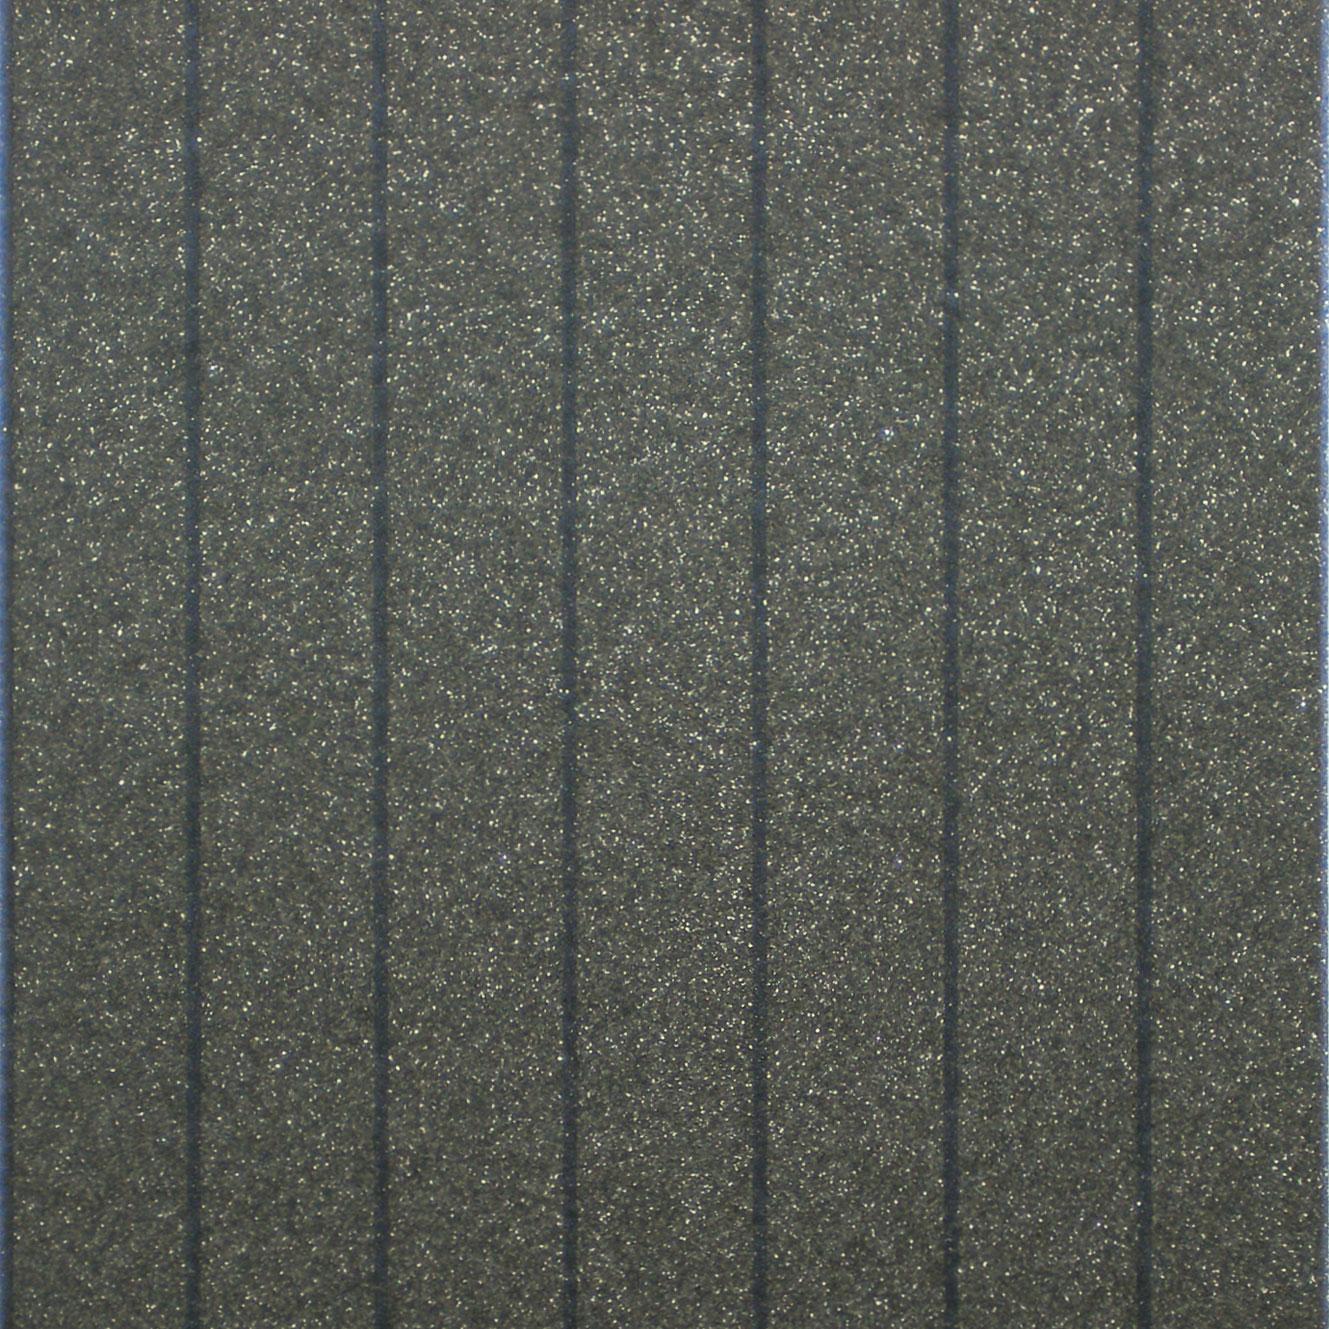 tapete von omexco ber tapetenraum ch f r 64 franken pro. Black Bedroom Furniture Sets. Home Design Ideas